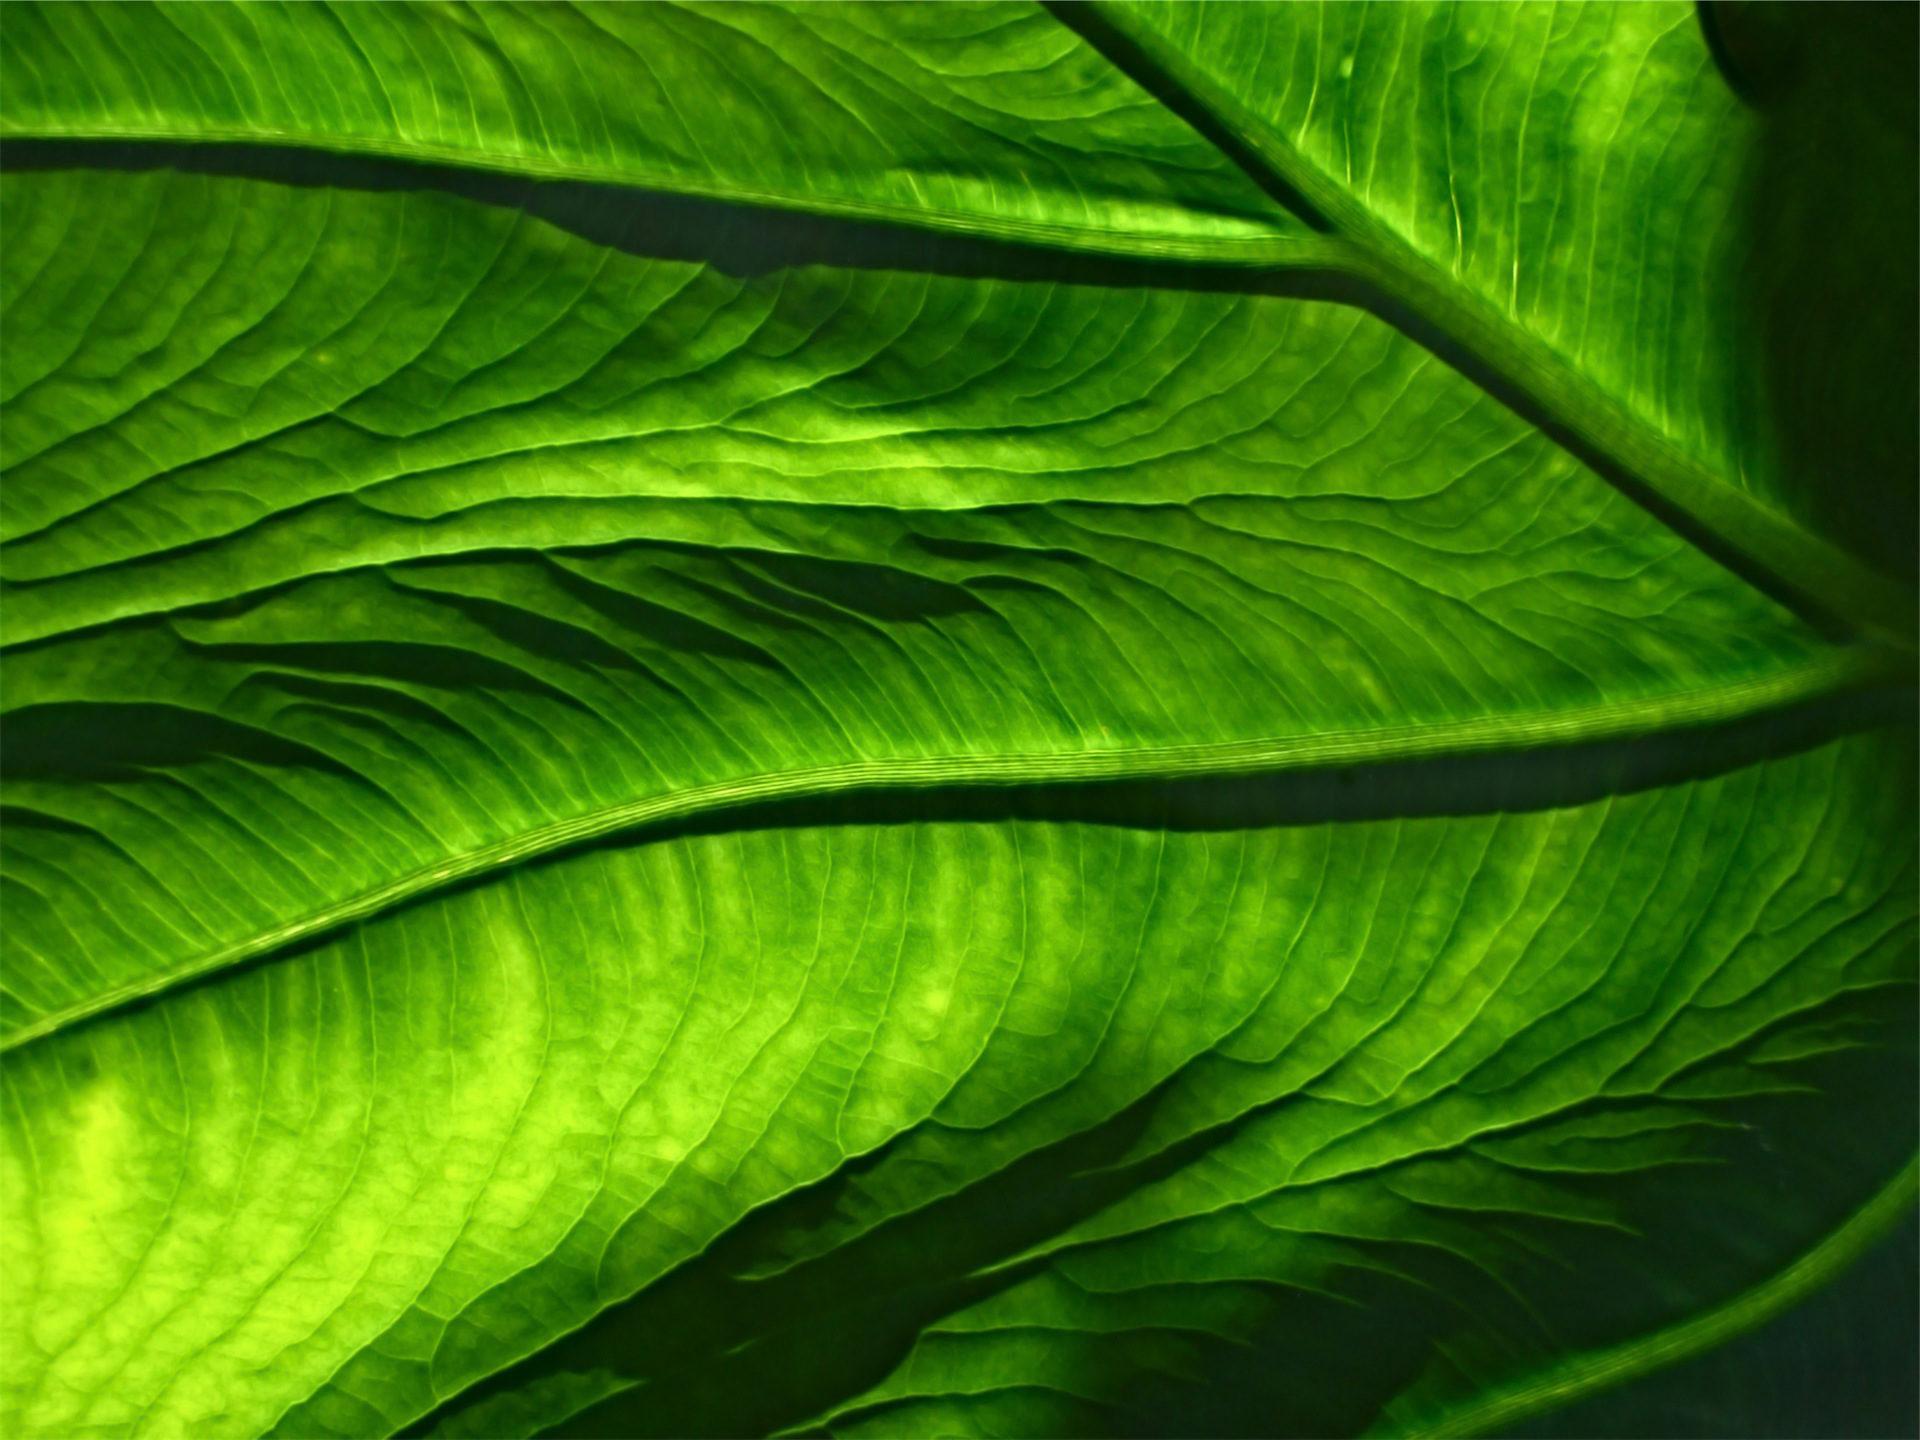 piso térreo, folha, veias, Flora, Verde - Papéis de parede HD - Professor-falken.com